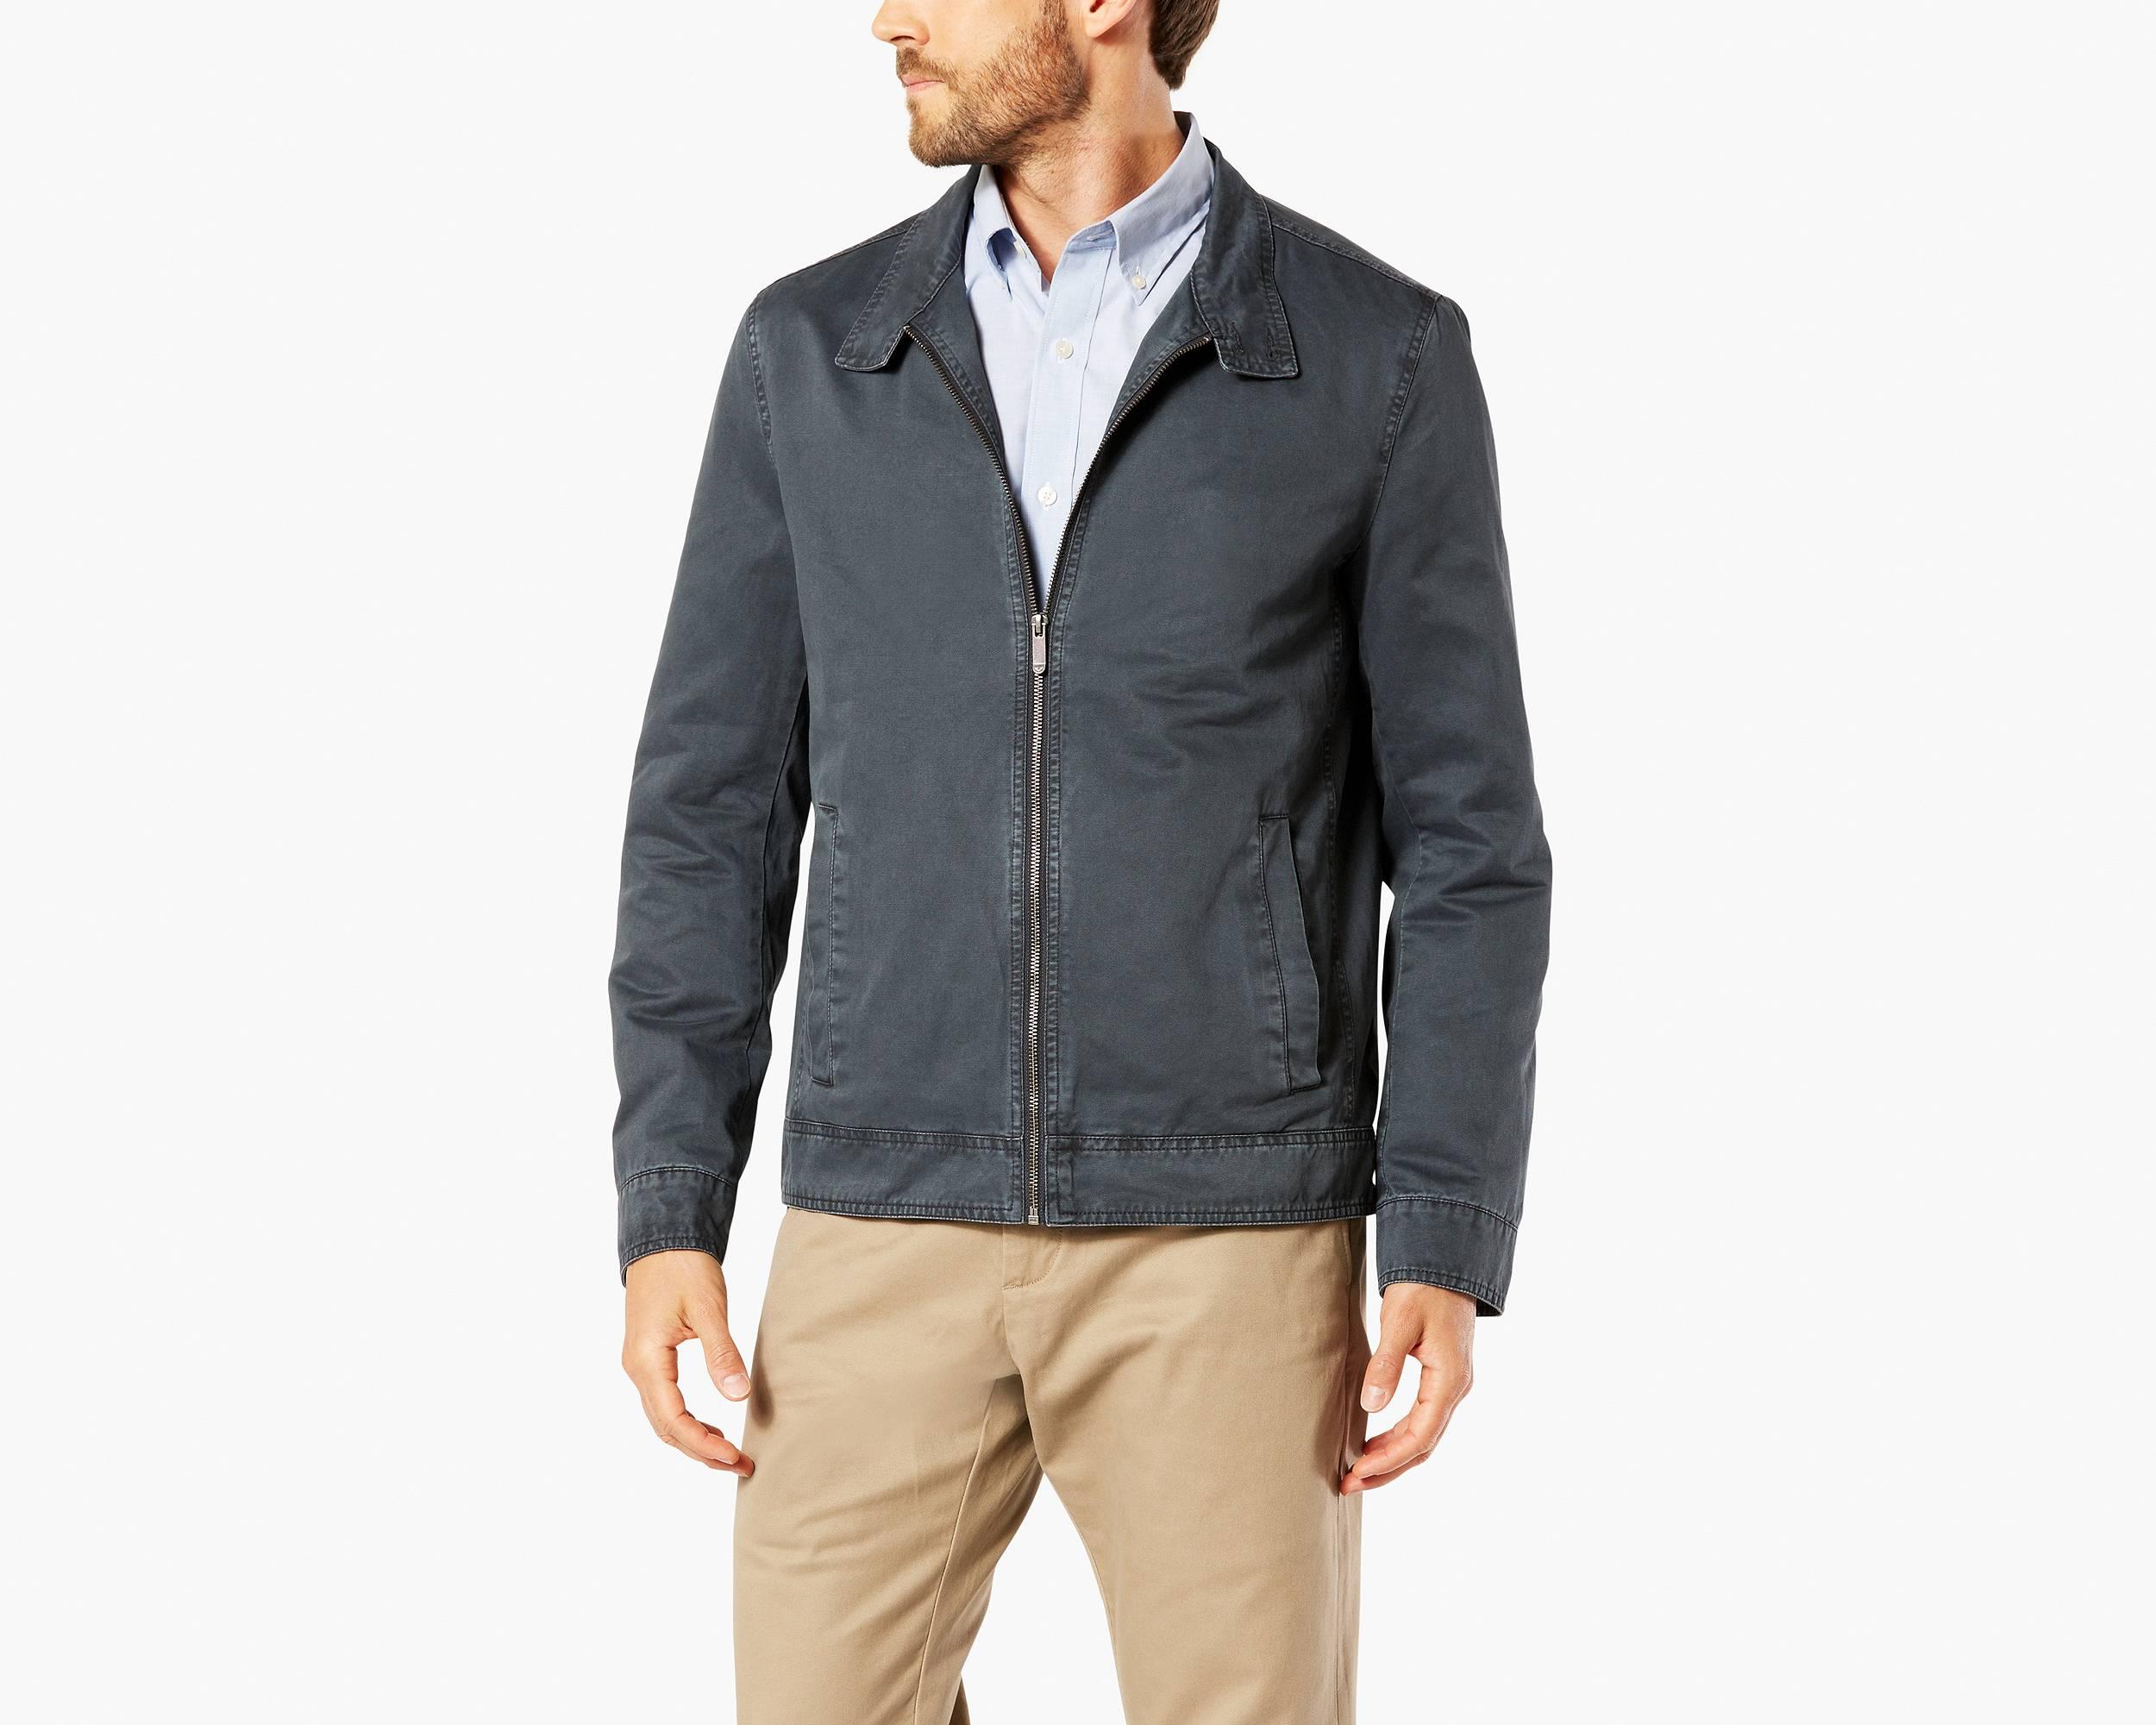 Jackets for Men - Shop Men's Jackets & Blazers | Dockers®